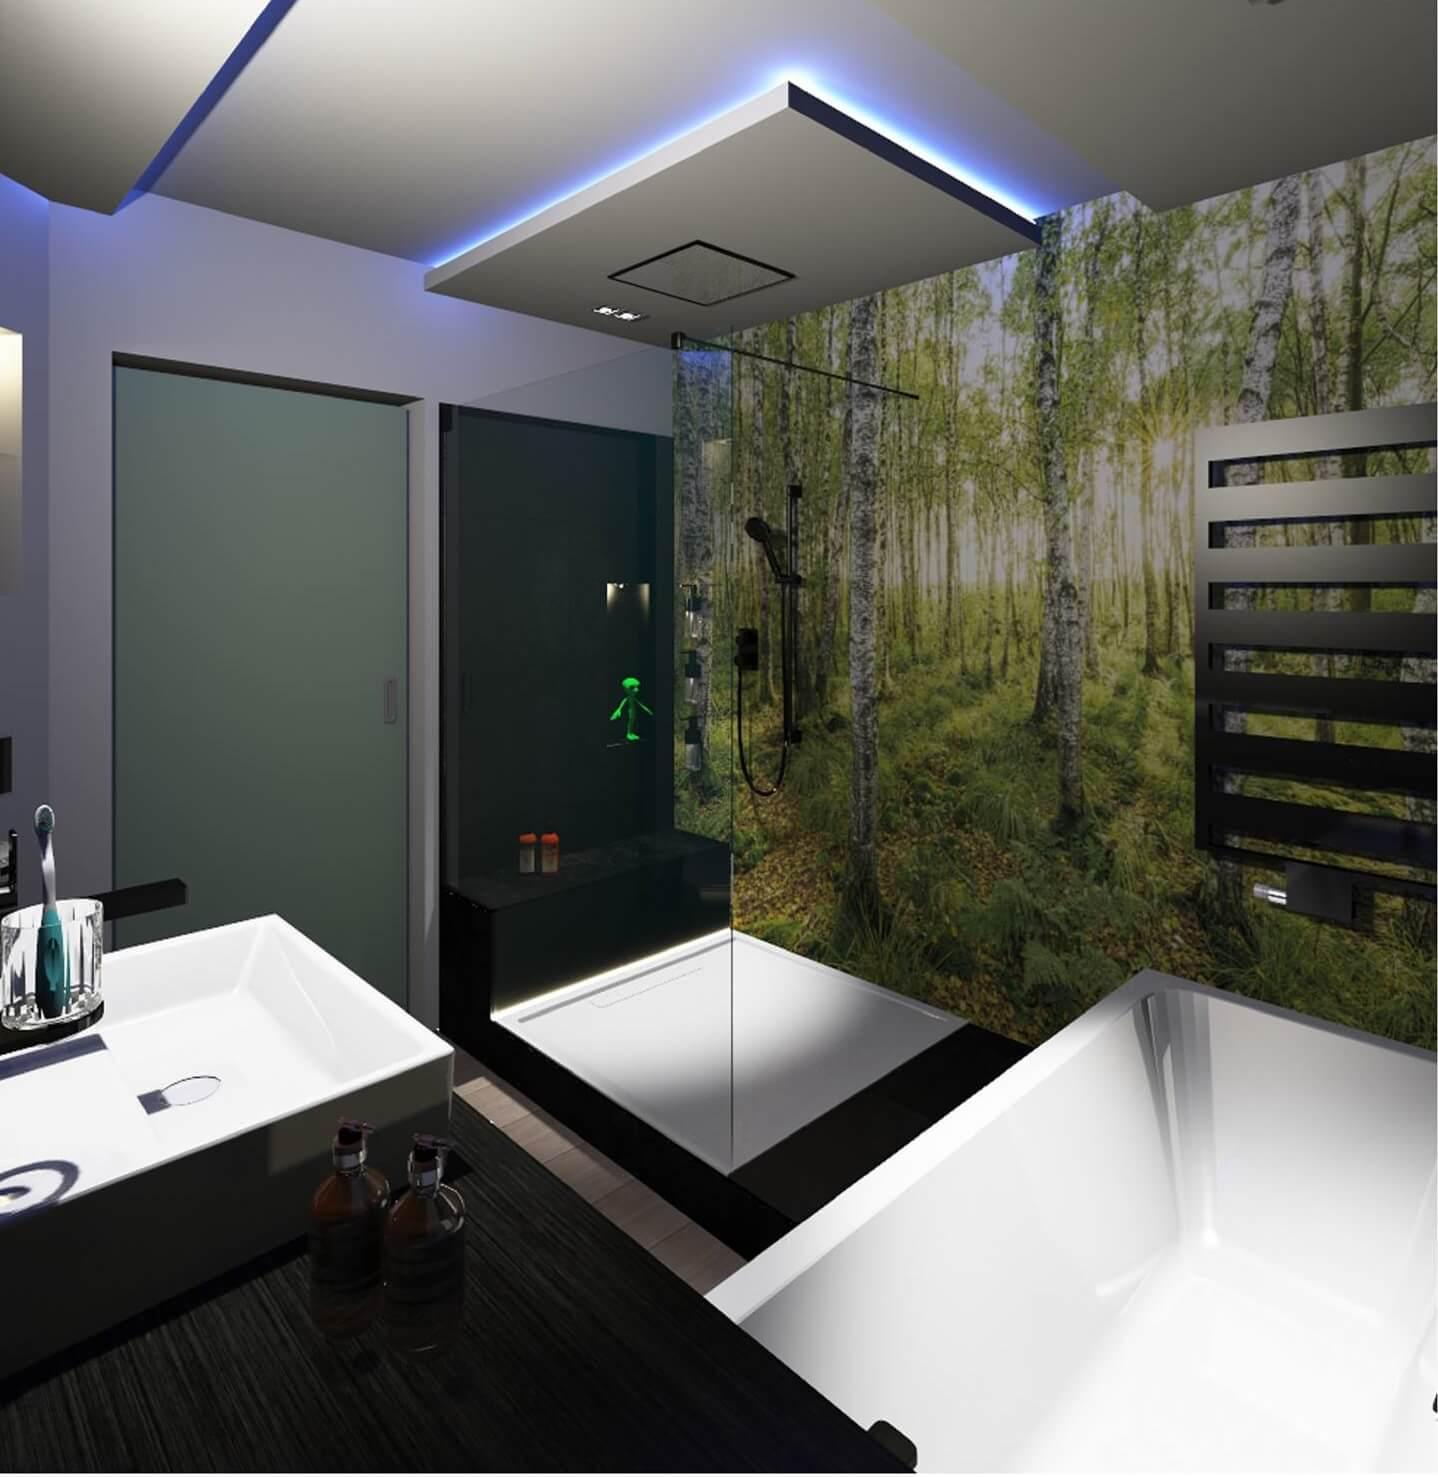 planung archive - design-bad, Badezimmer ideen